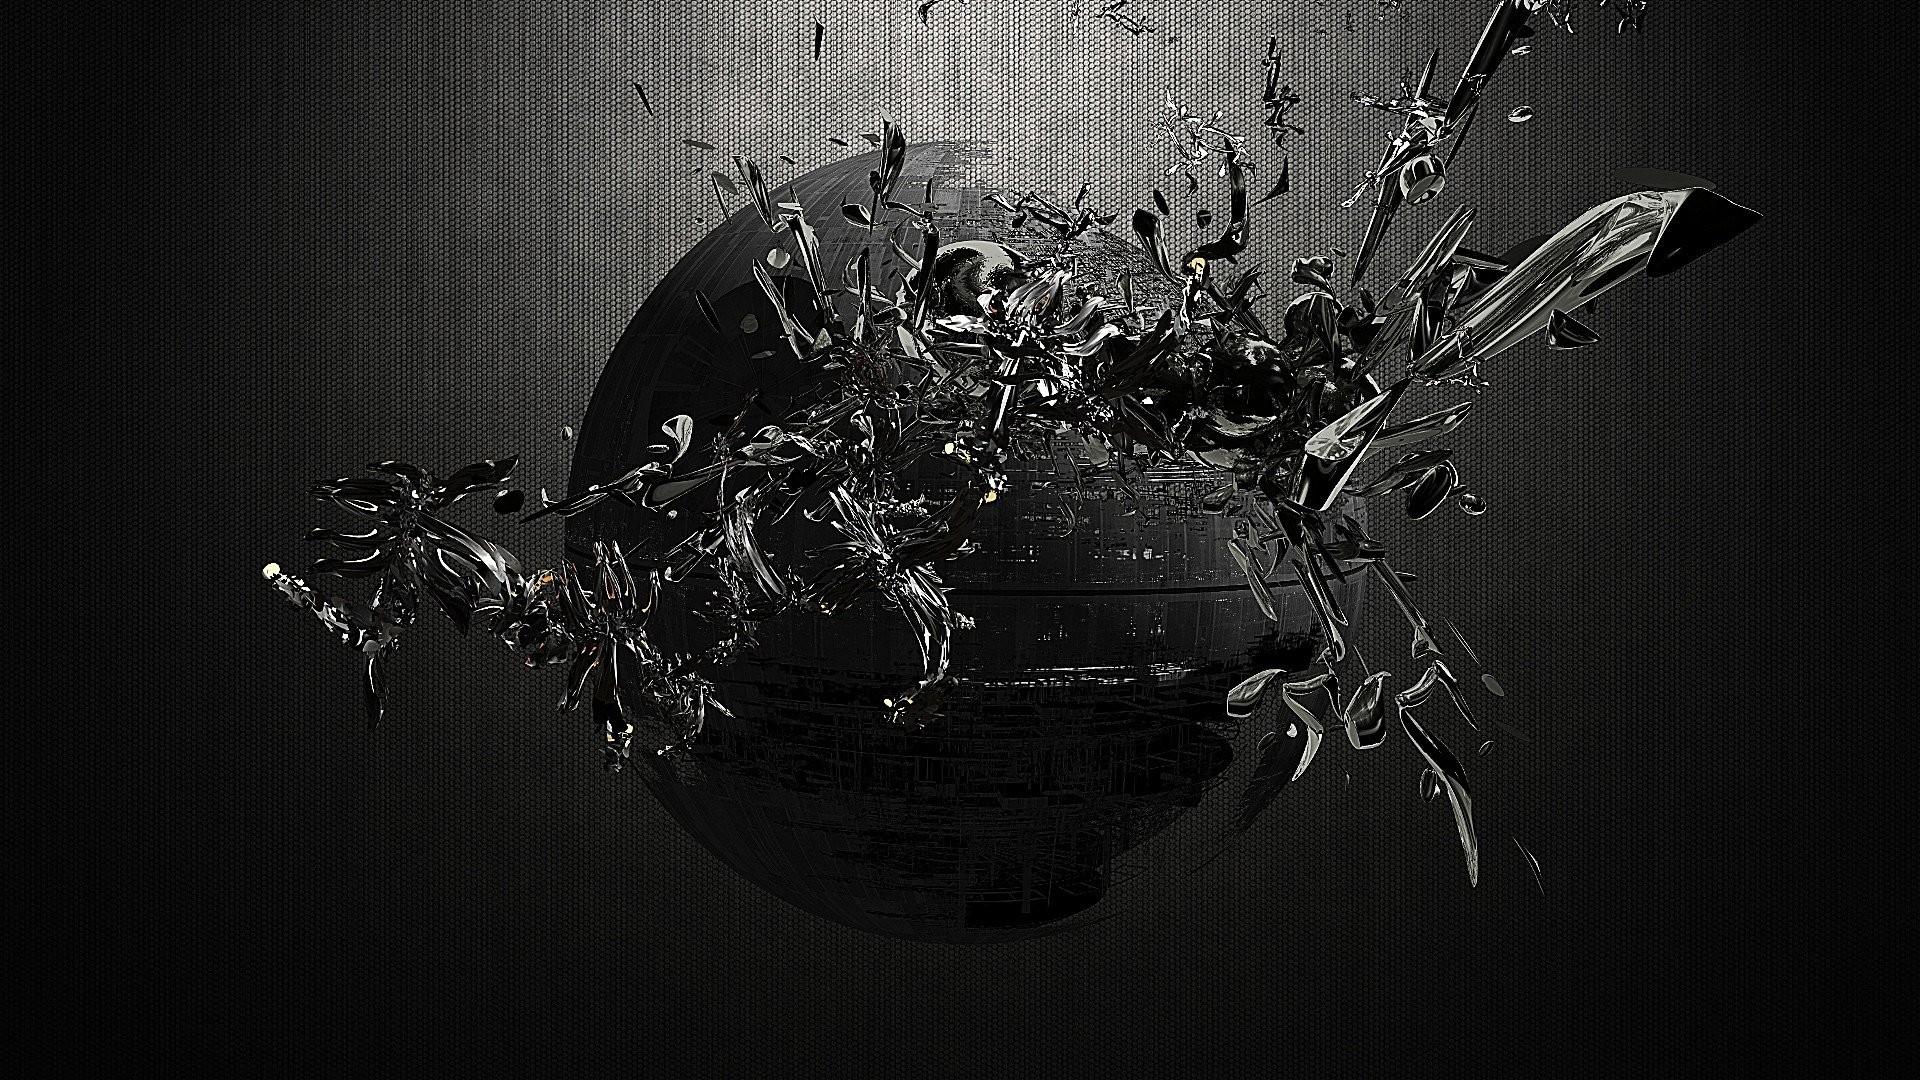 Death Star Hangar Wallpaper 64 images